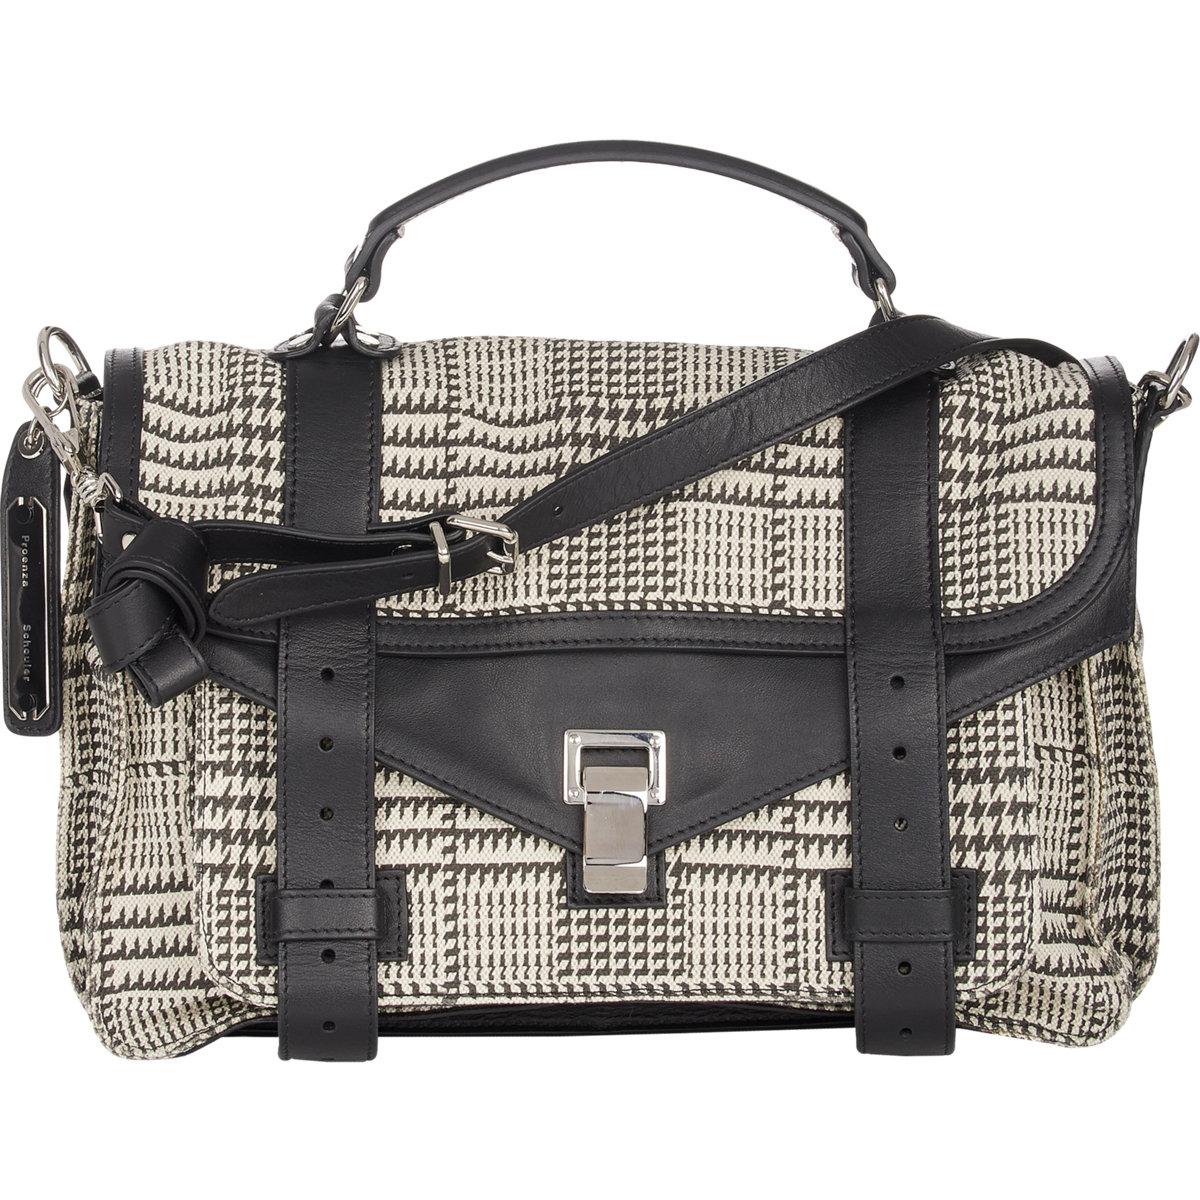 37d84ae4c436 Proenza Schouler Houndstooth Ps1 Medium Shoulder Bag - Lyst